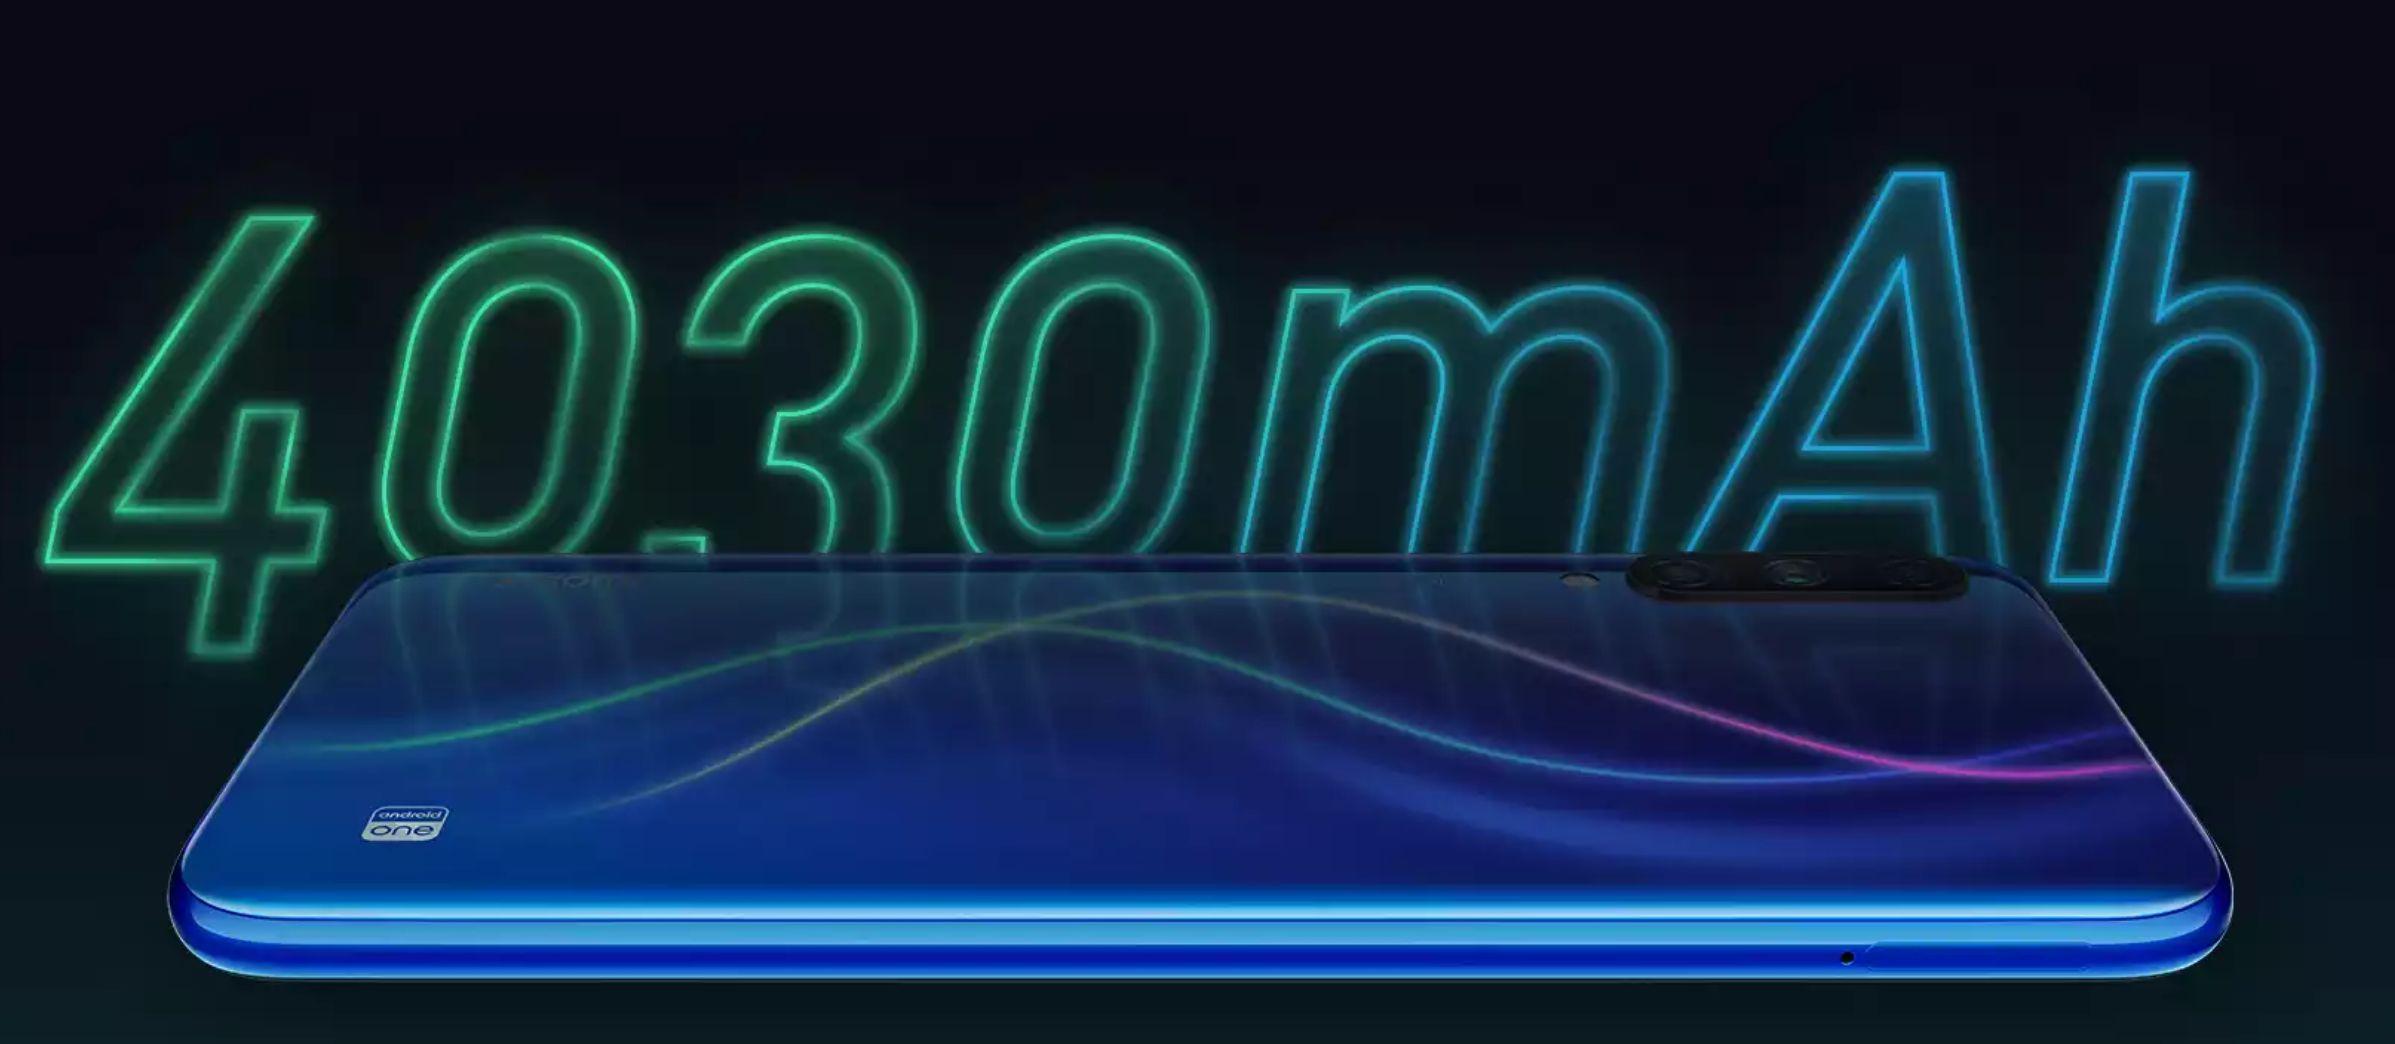 Xiaomi Mi A3 4030mAh battery